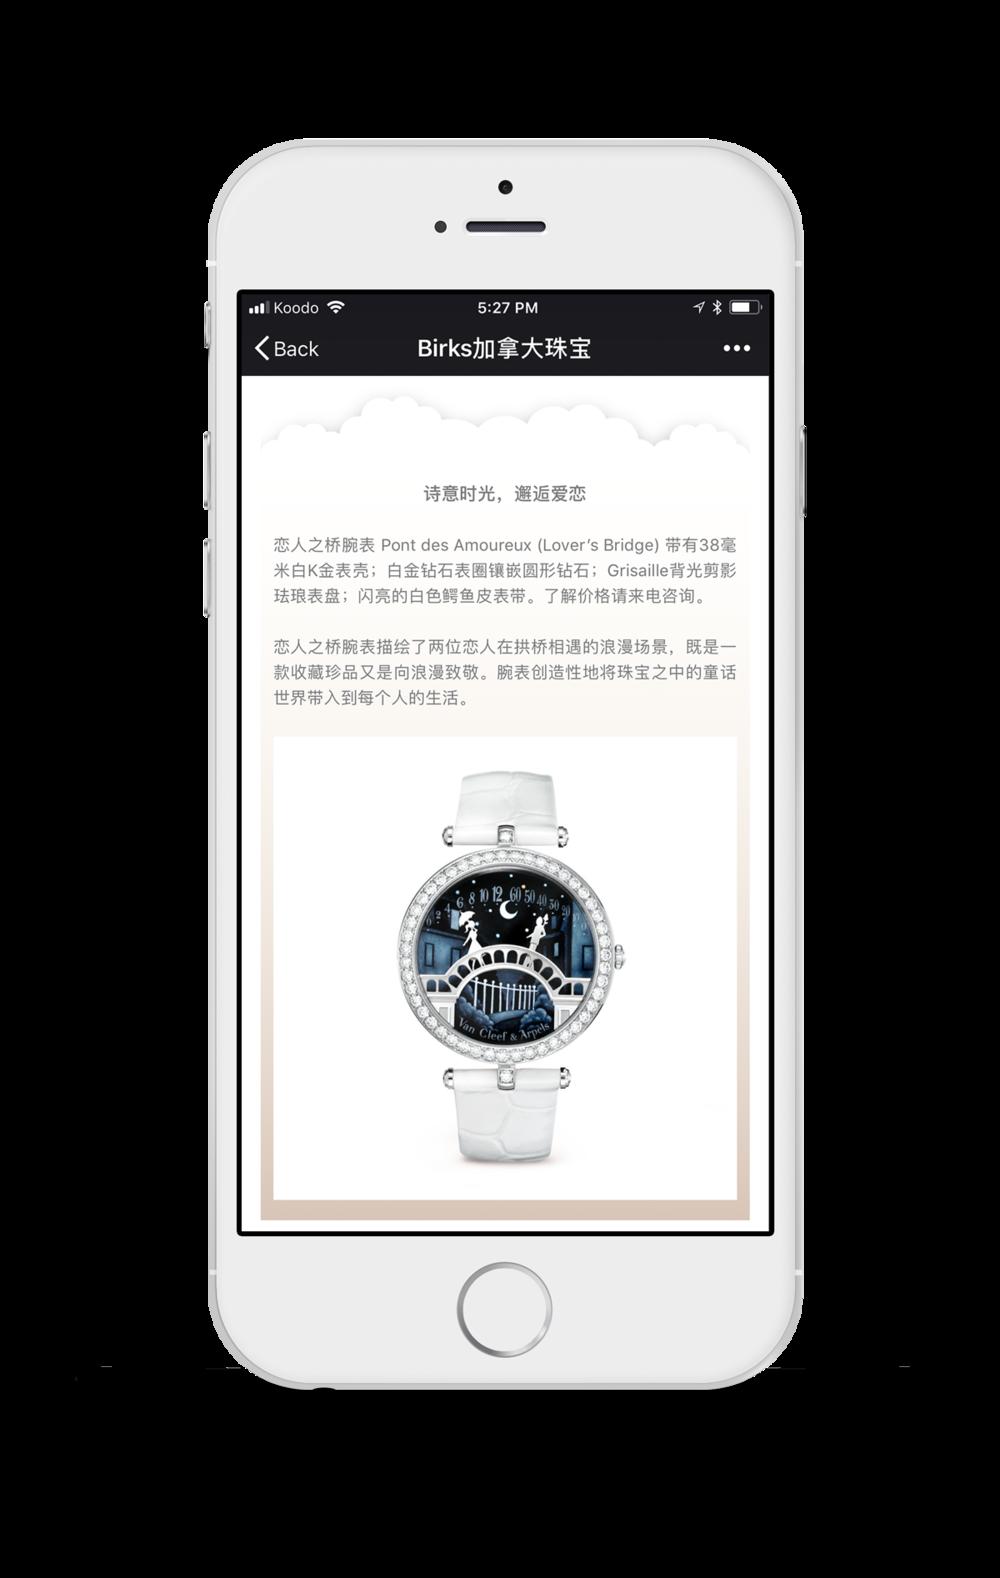 Birks-Chaumet-WeChat-Screenshot-2.png